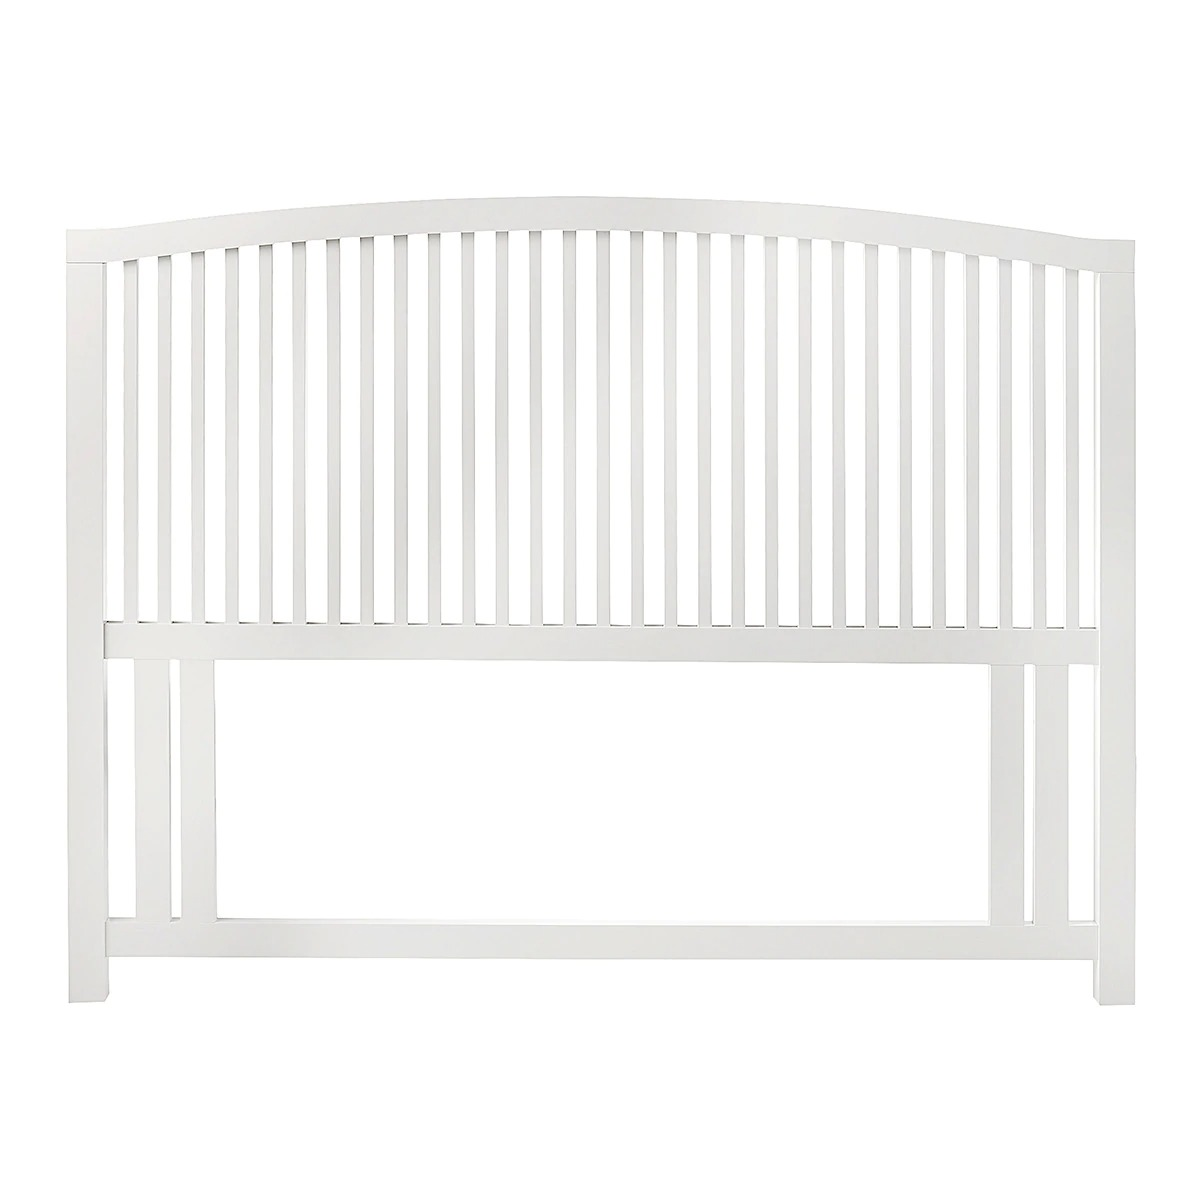 Cabecero doble cama Ashby